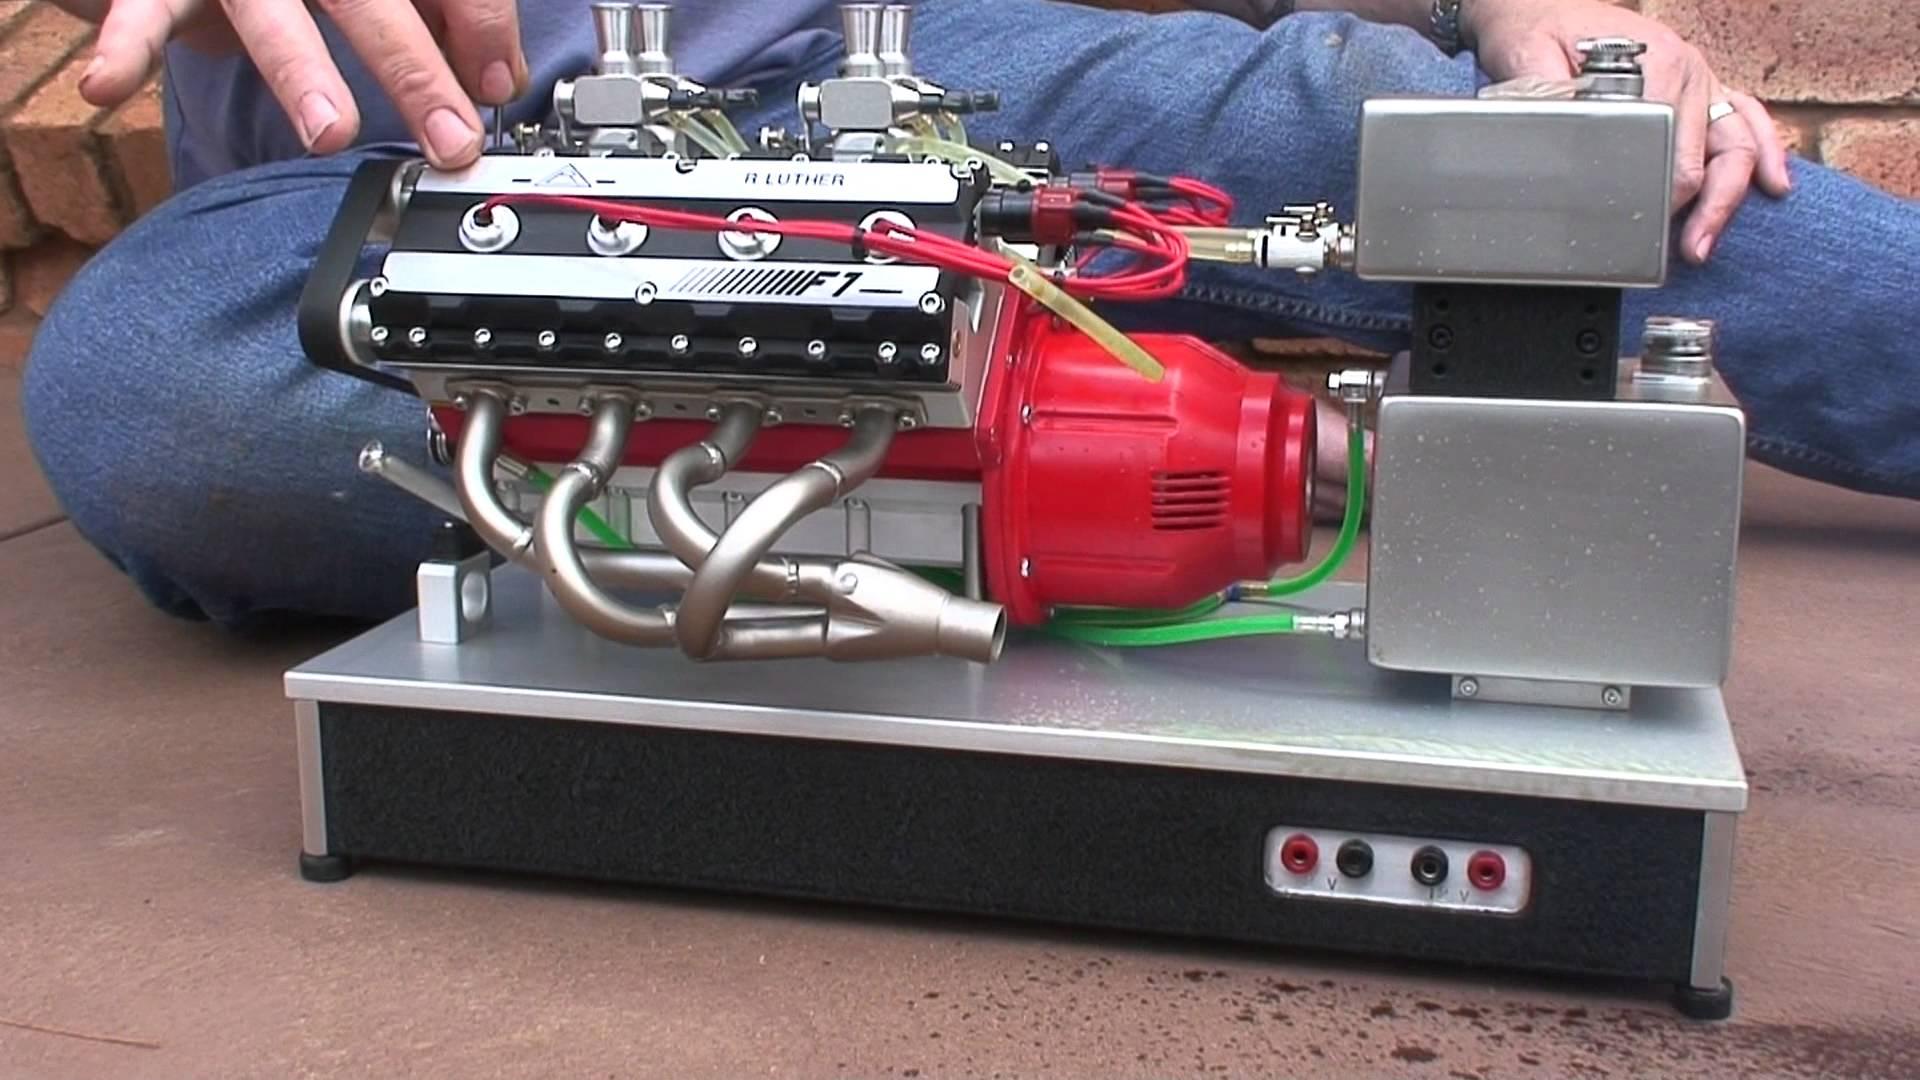 Incredible Handmade Miniature V8 With Nitro